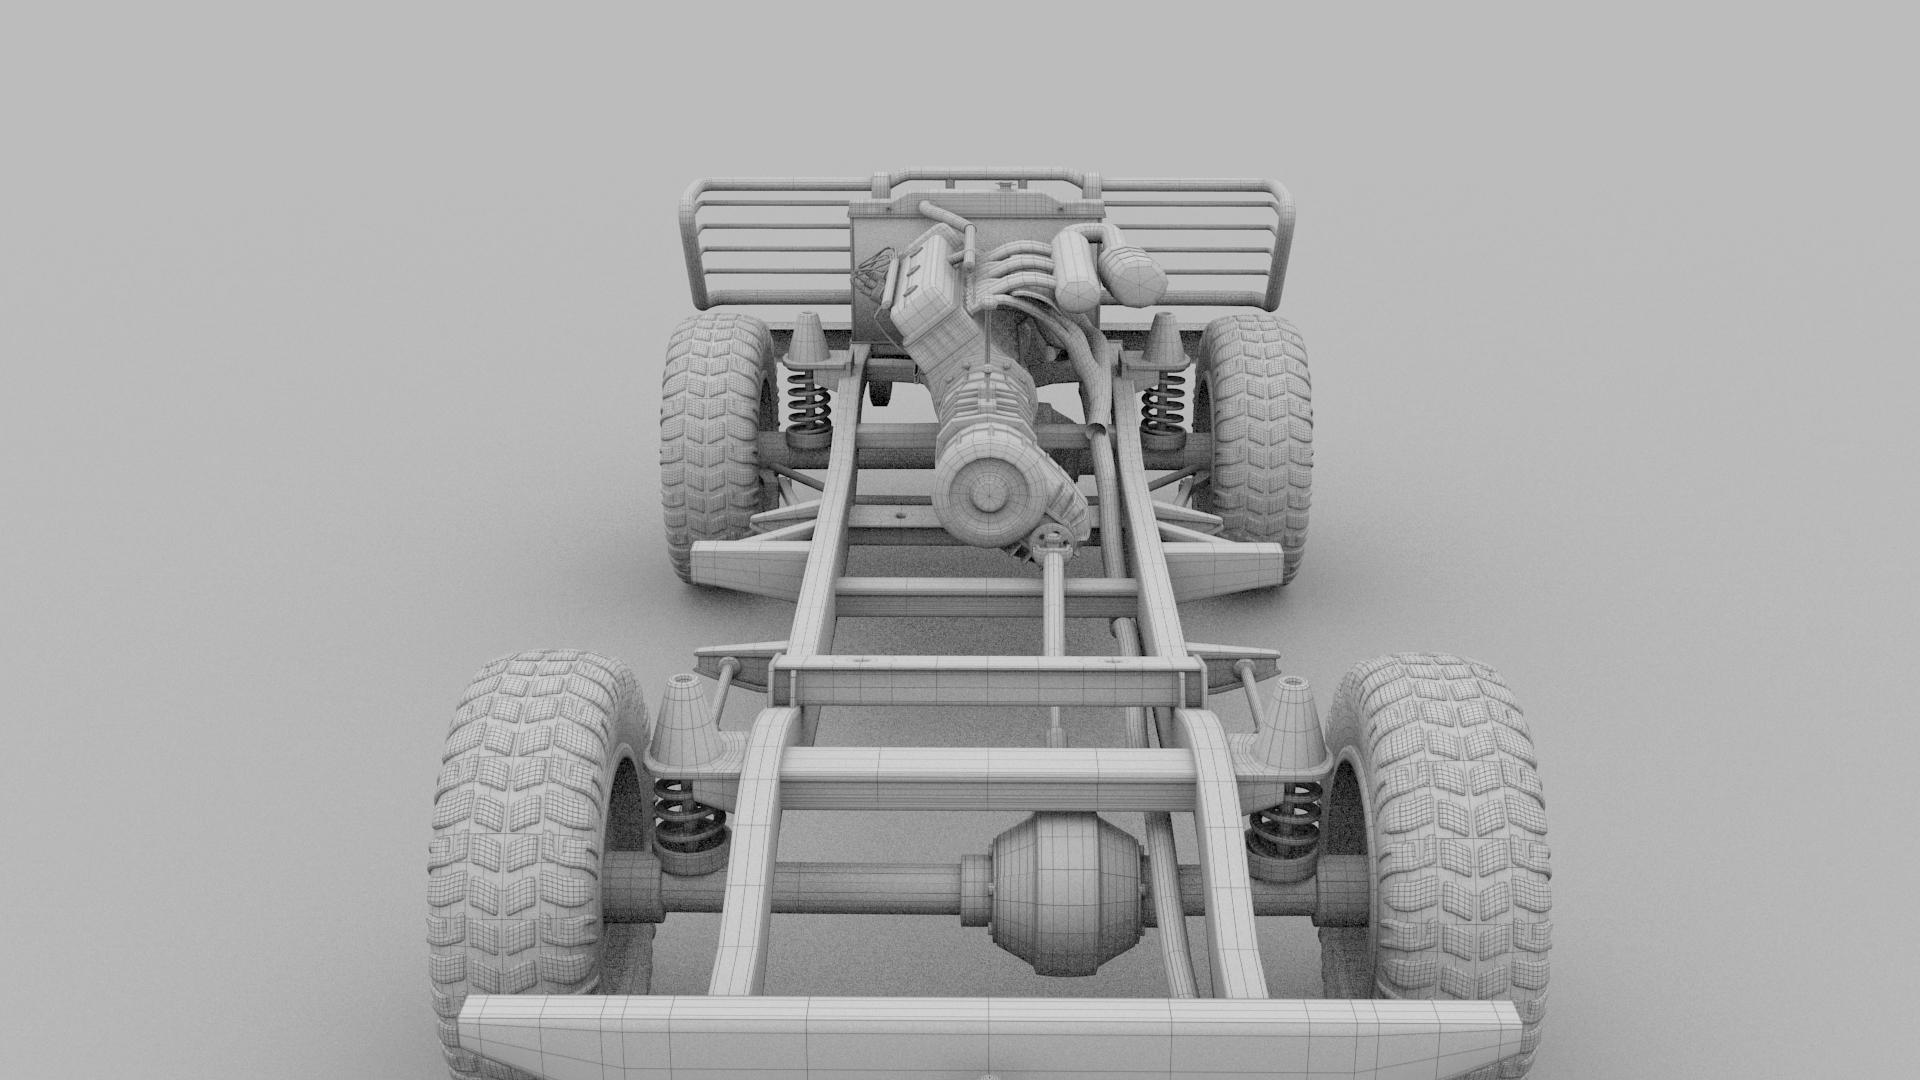 Full Land Rover Defender 90 Pick Up HDRI by dragosburian